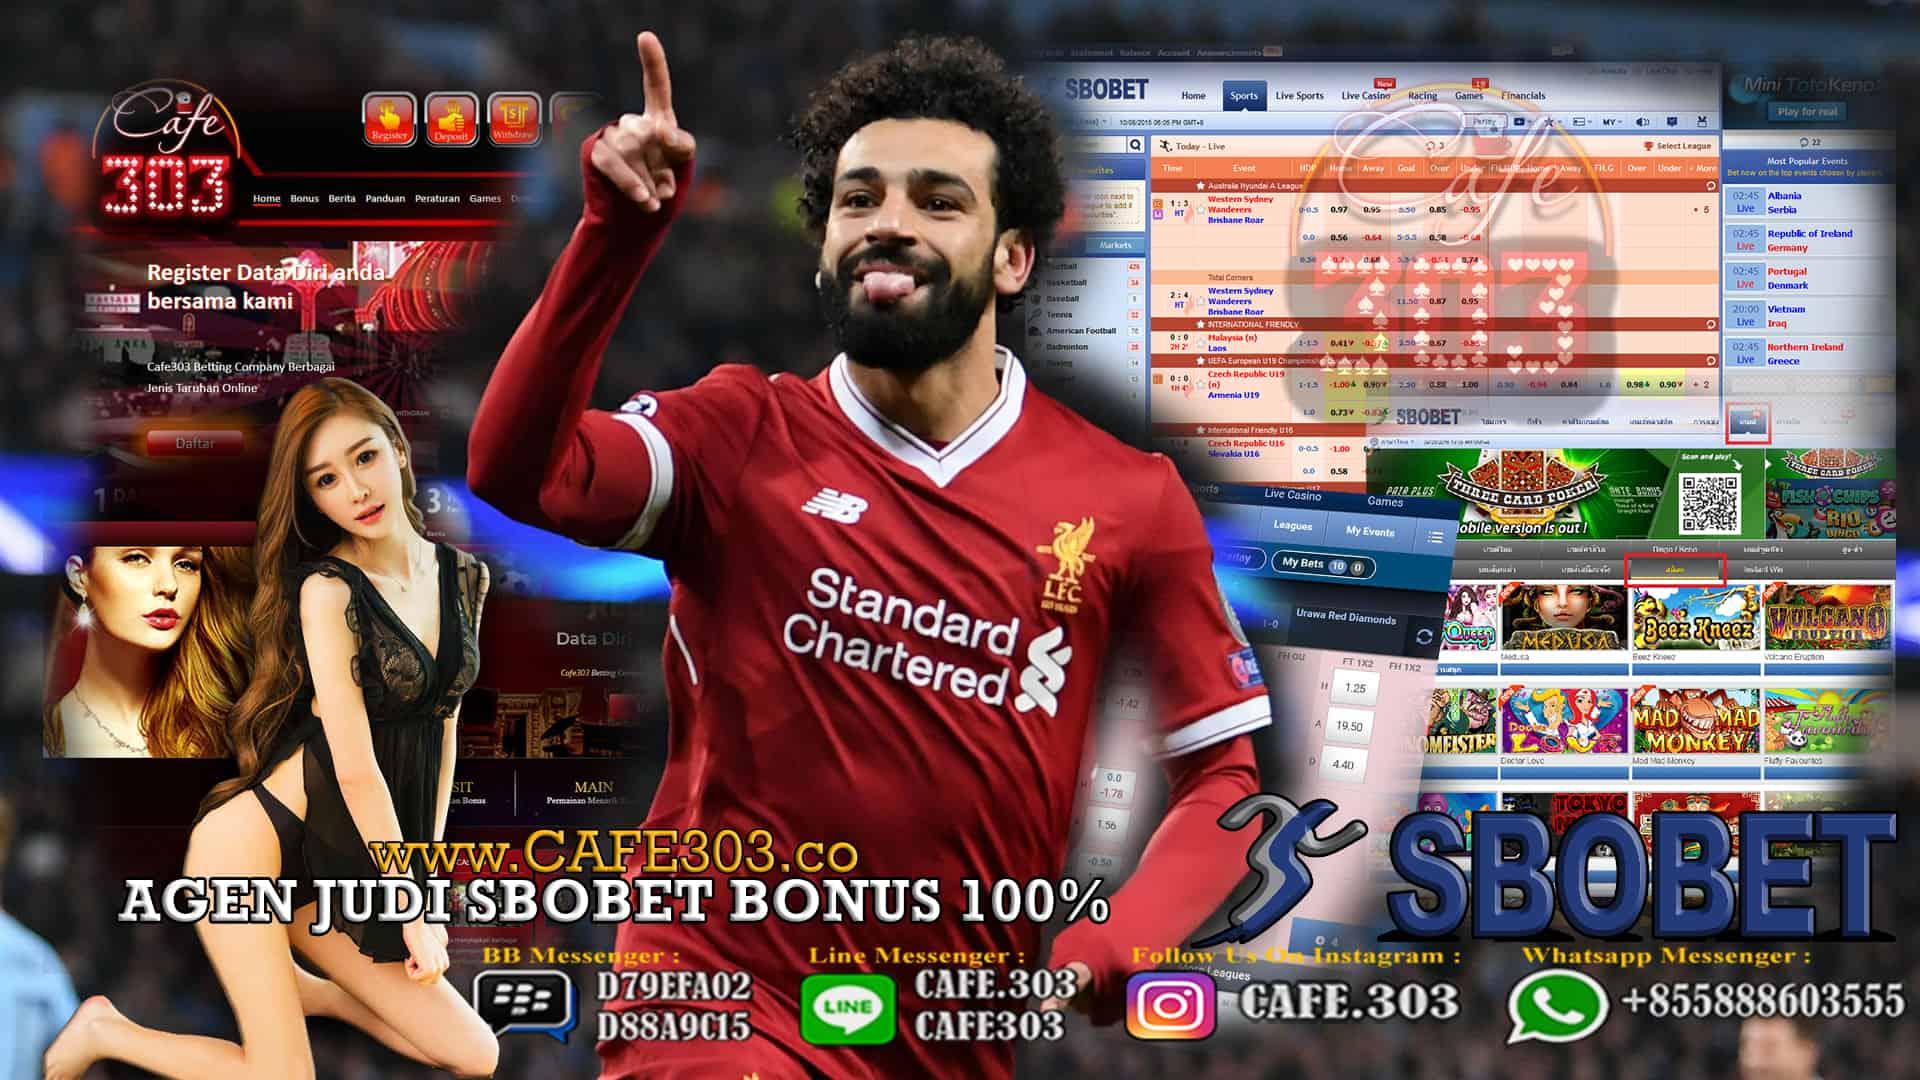 Bandar Judi Bola Bonus Terbesar 2019